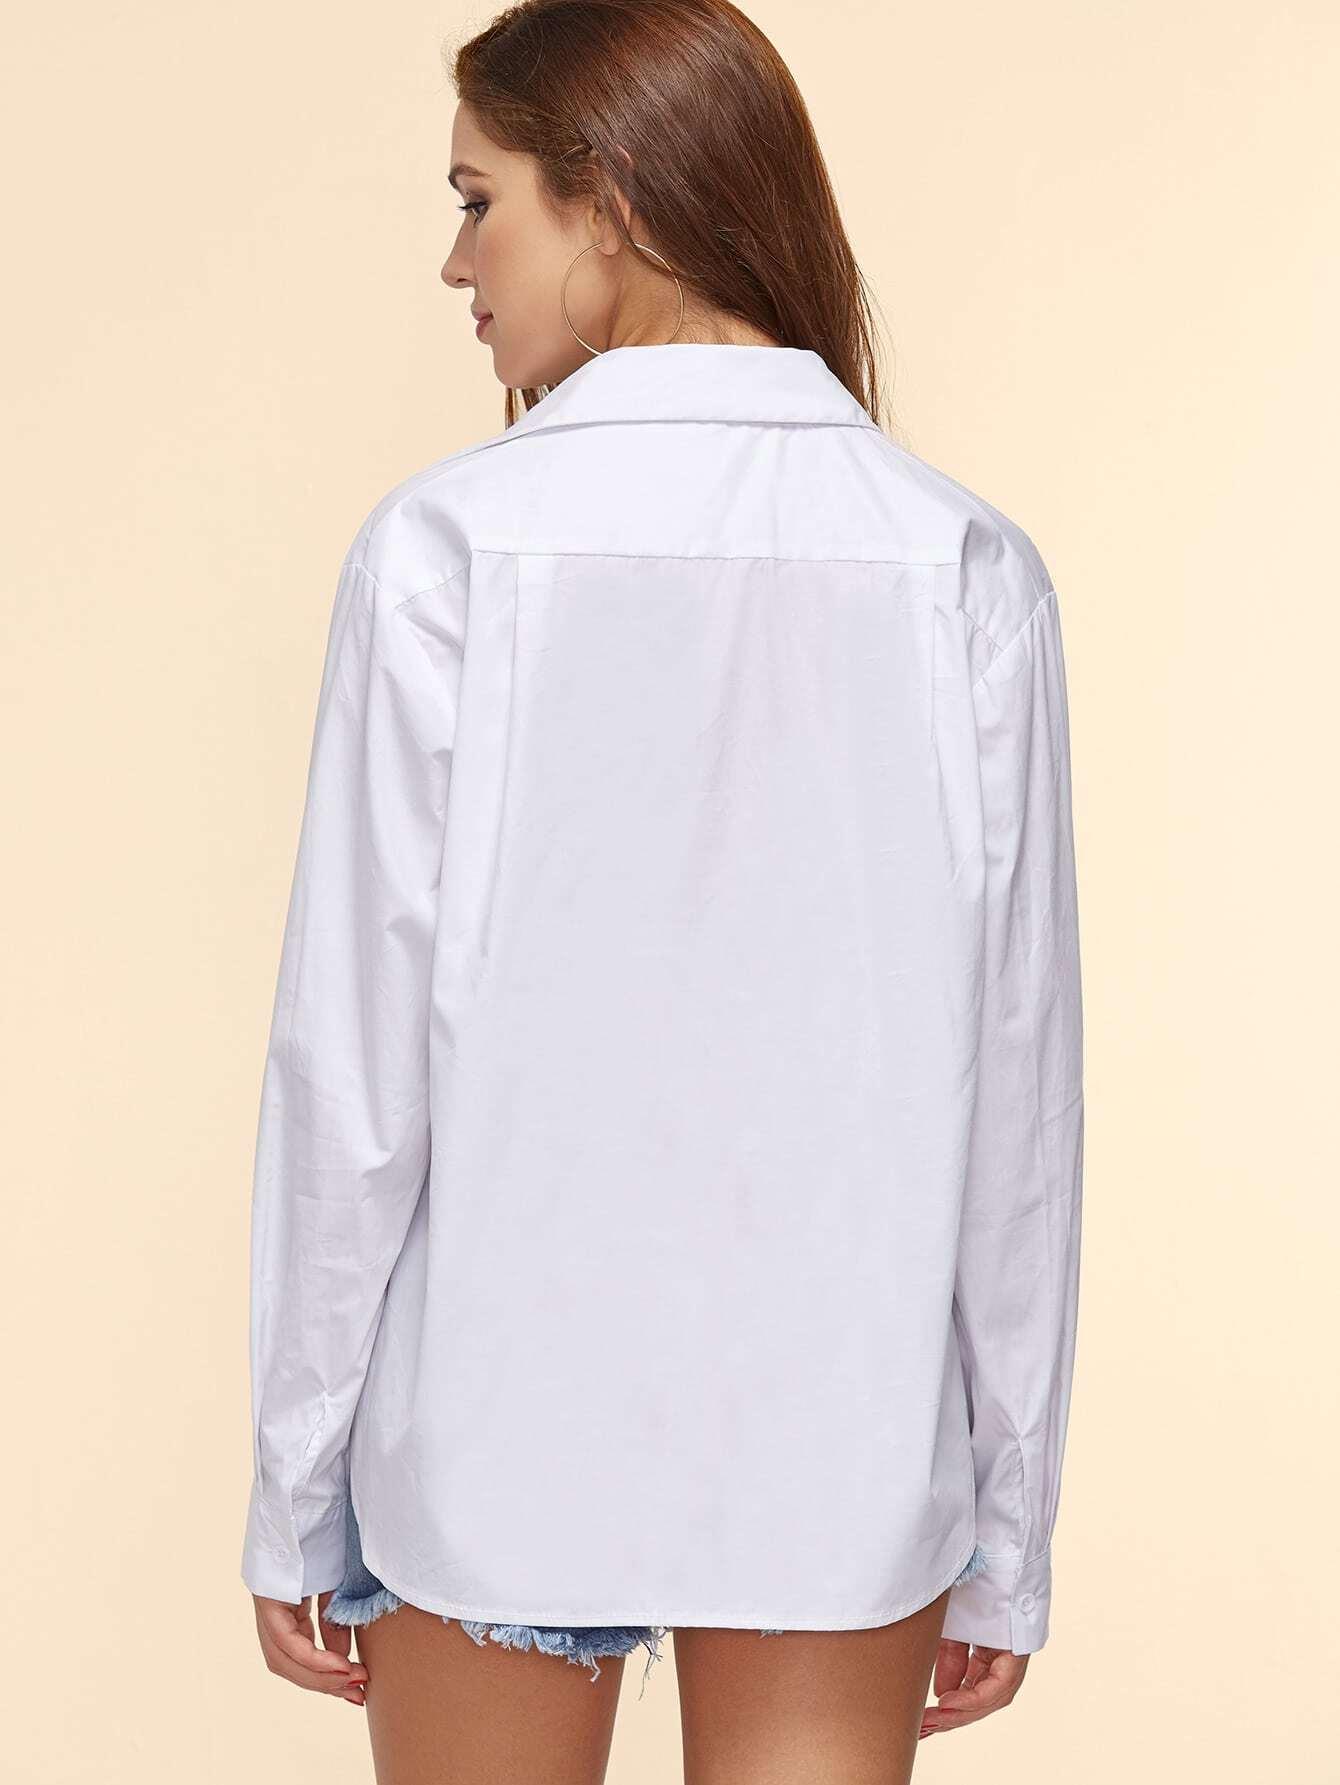 blouse161109450_2